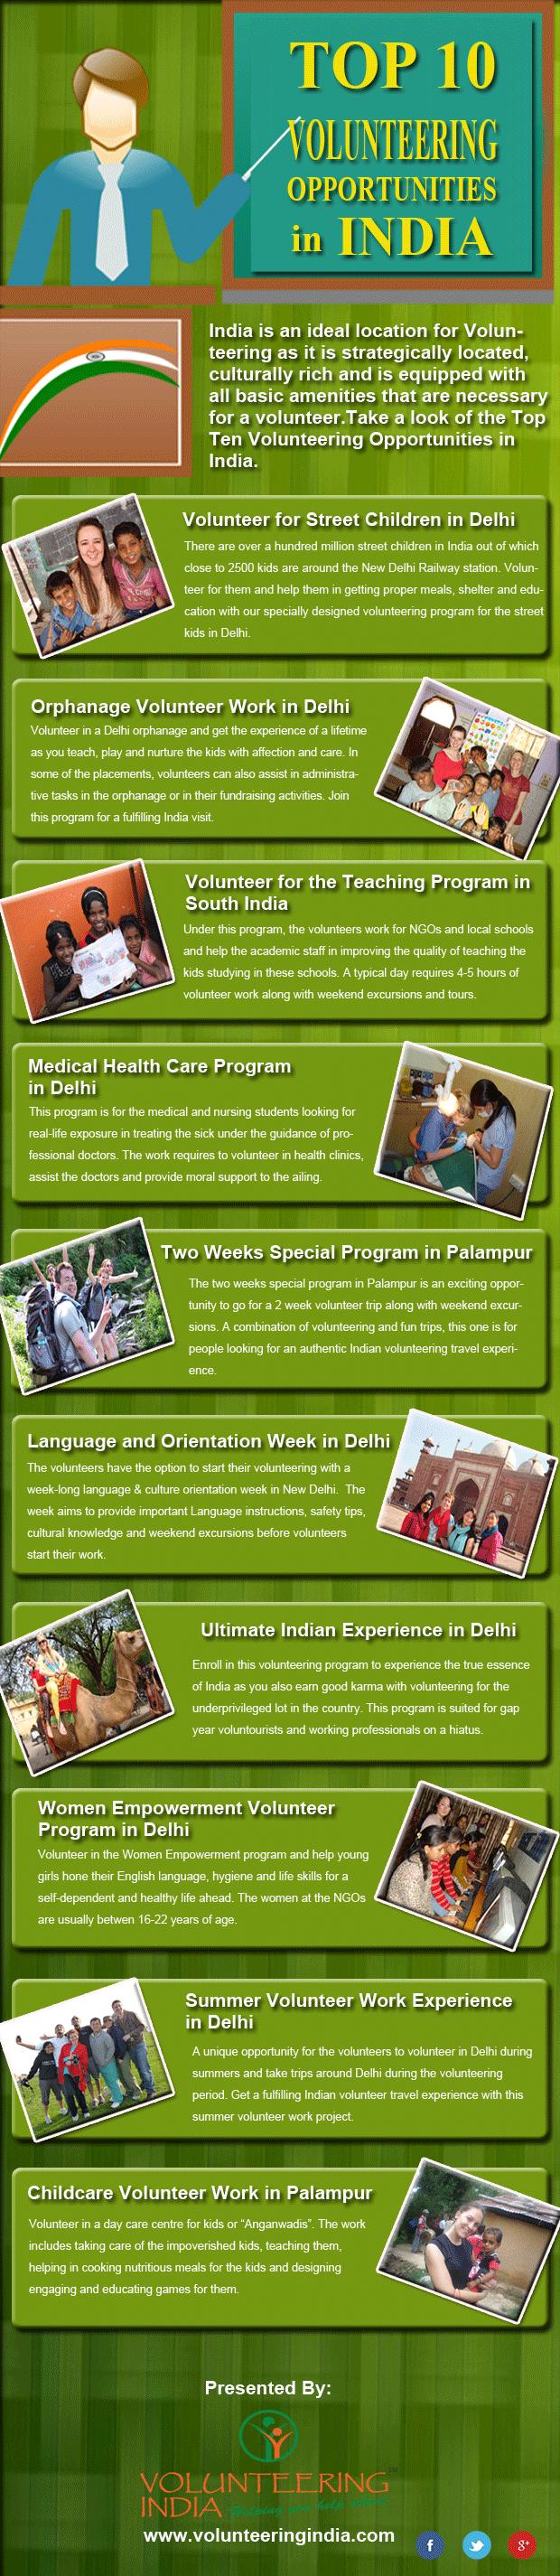 Volunteering Opportunities in India with VI